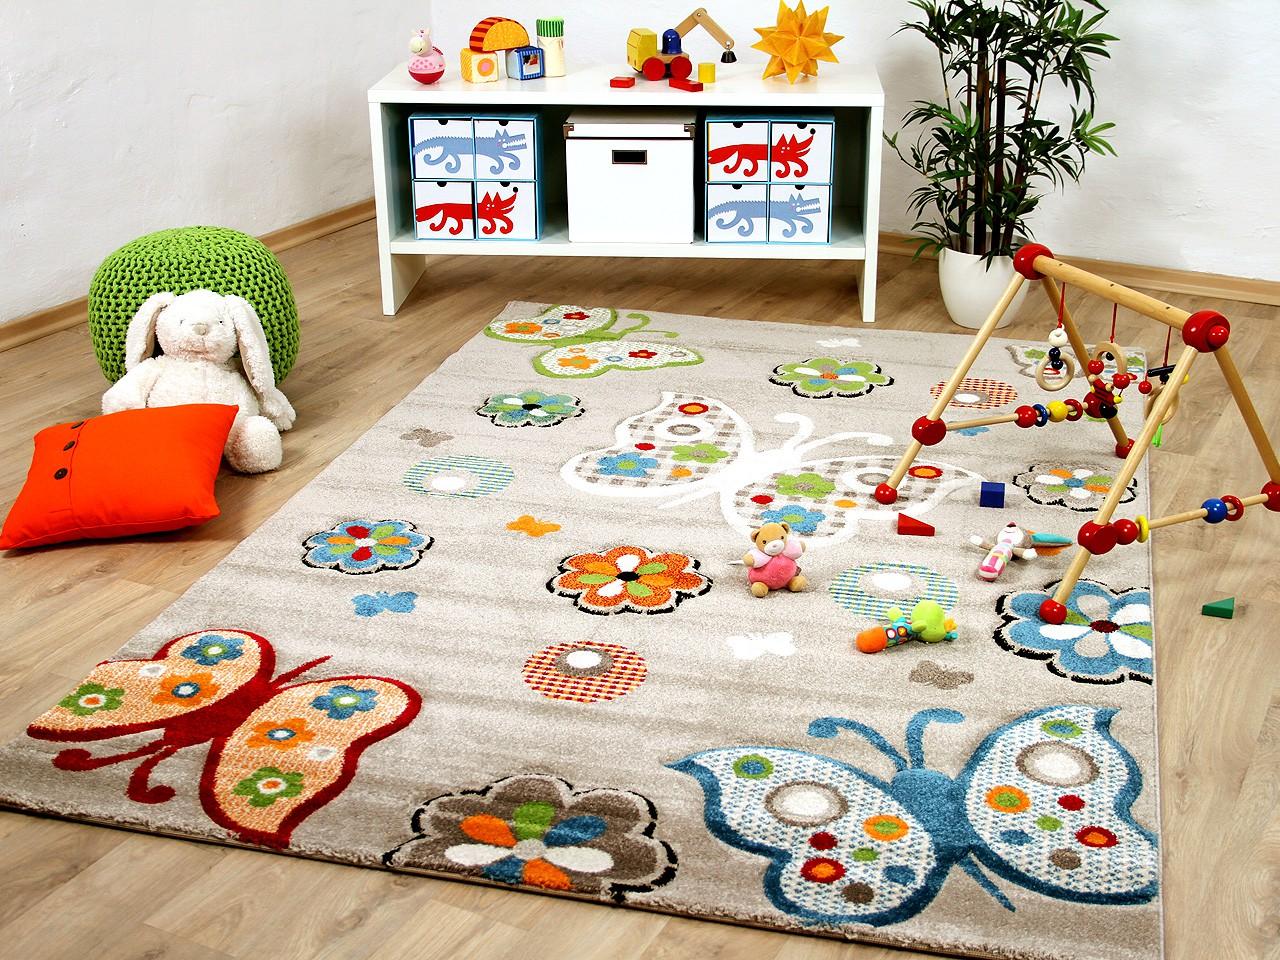 Full Size of Teppich Savona Kids Beige Schmetterlinge Bunt Teppiche Regale Kinderzimmer Regal Sofa Wohnzimmer Weiß Kinderzimmer Teppiche Kinderzimmer